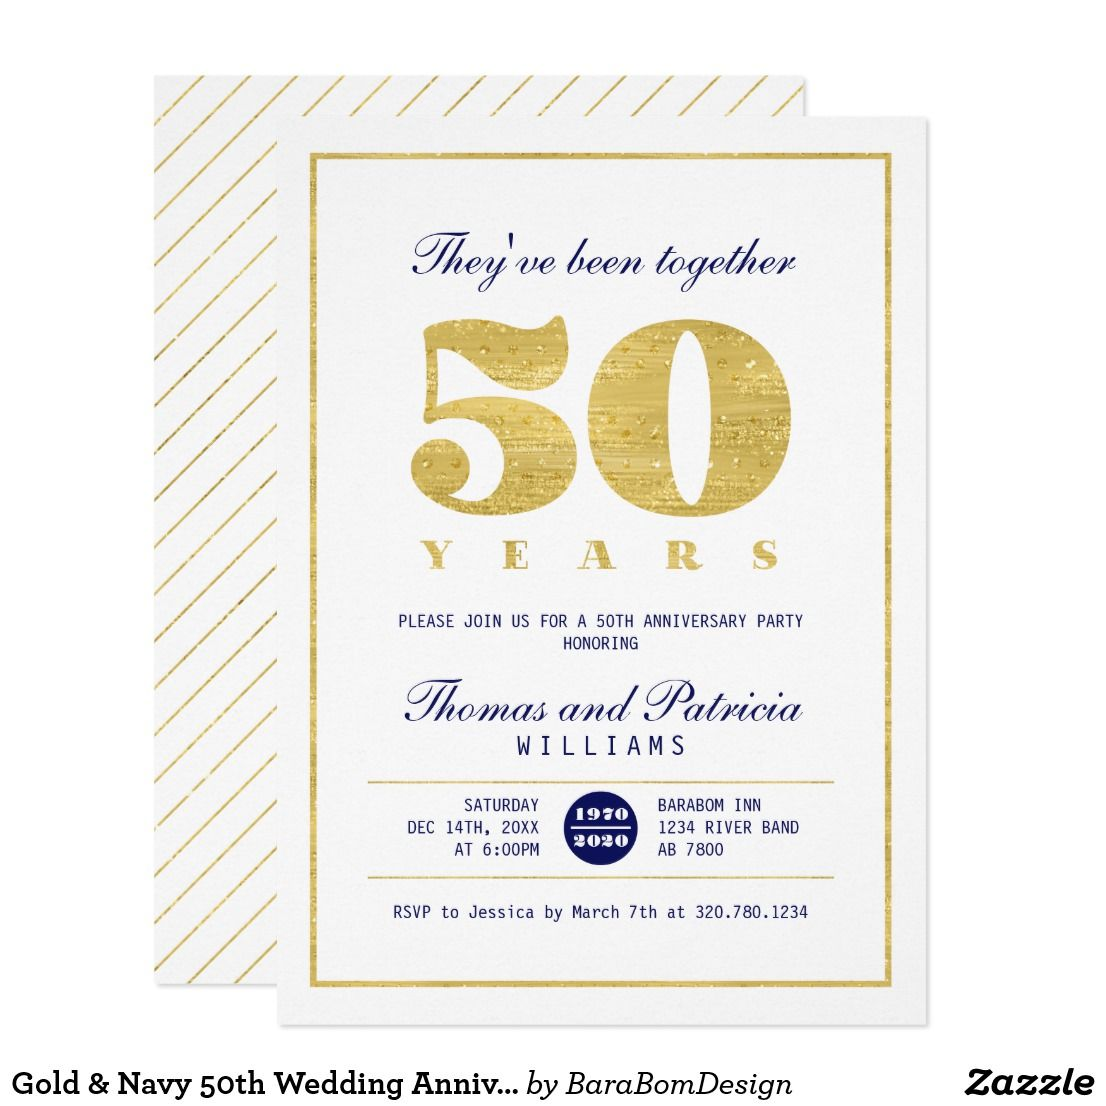 Gold & Navy 50th Wedding Anniversary Invitation | Pinterest | 50th ...